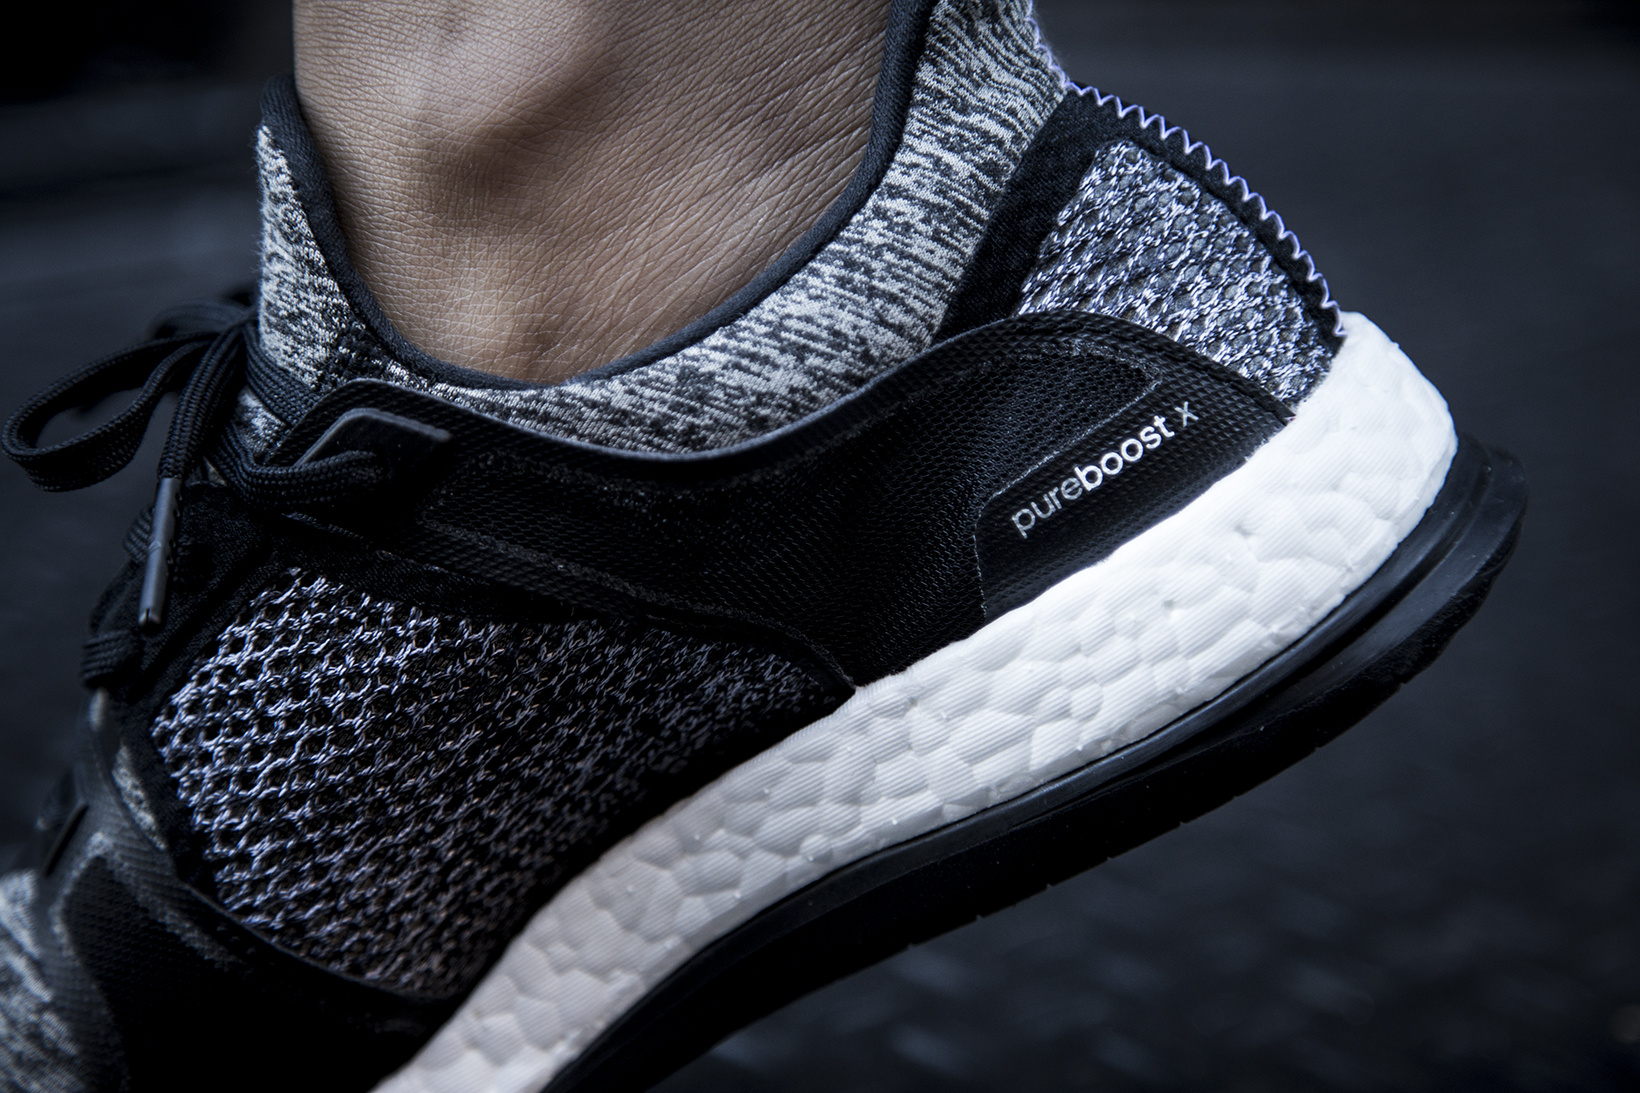 reigning-champ-adidas-pureboost-closer-look-6.jpg